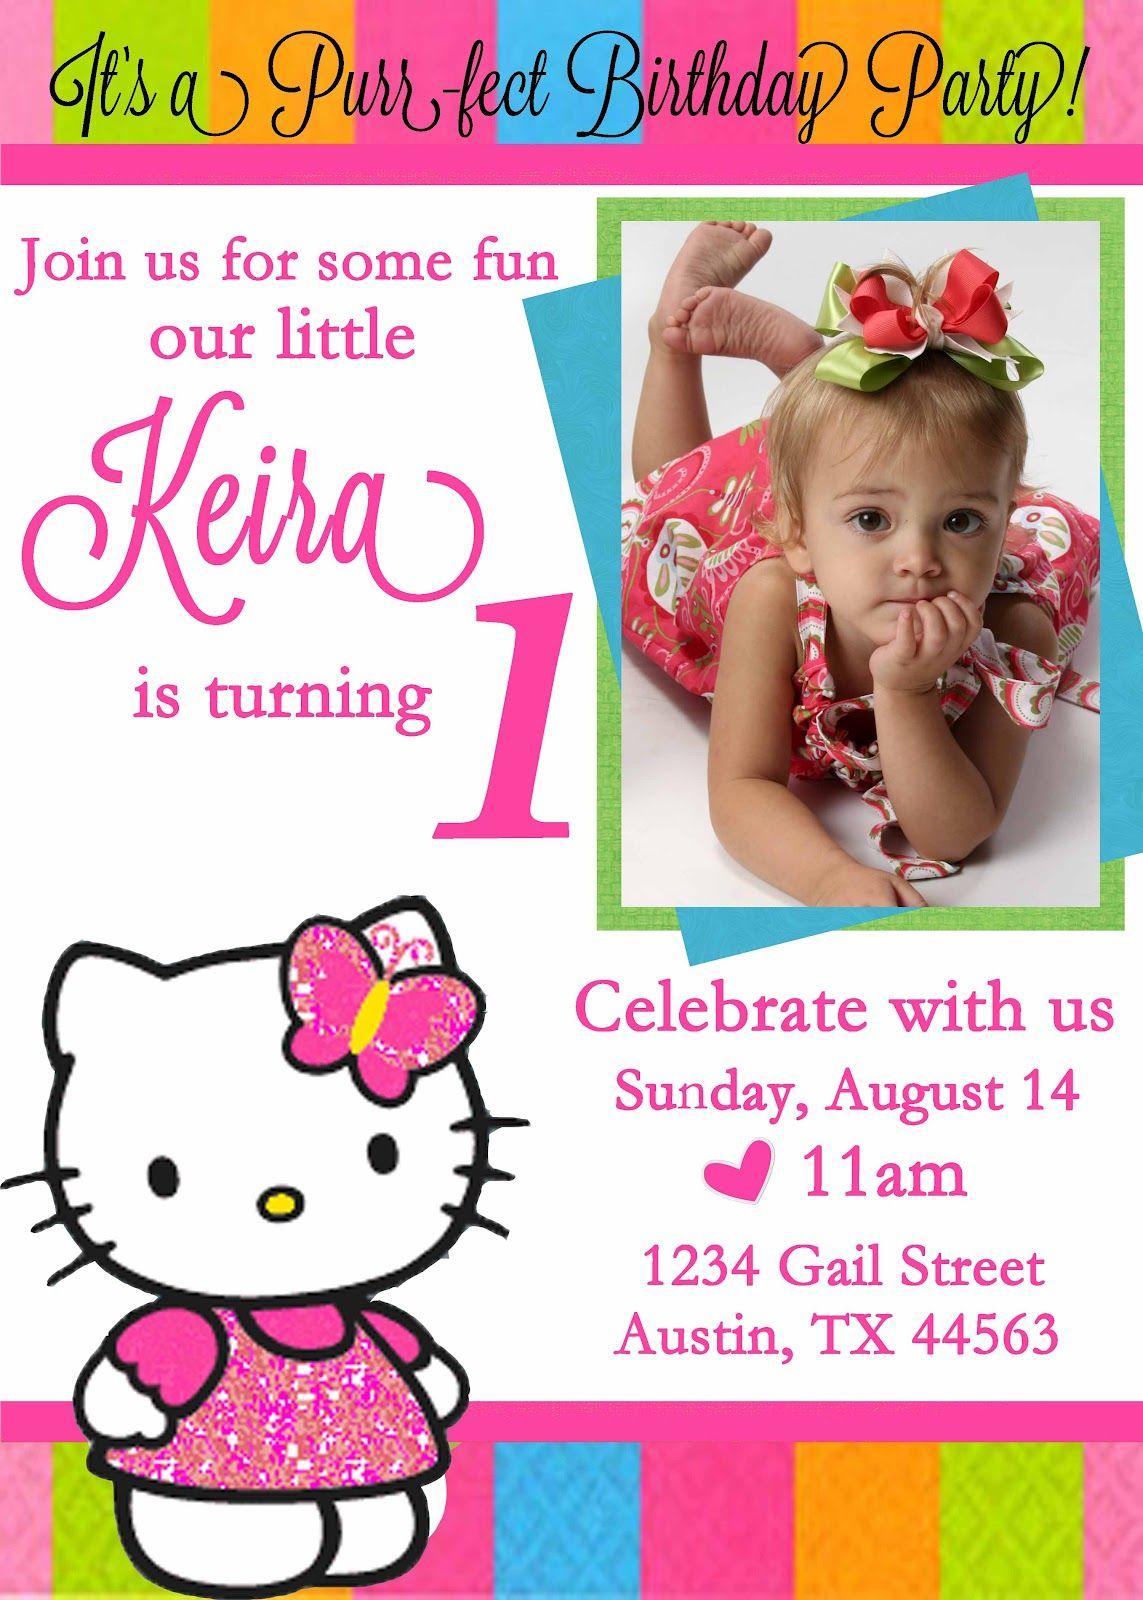 Personalized Hello Kitty Birthday Invitations - | Free Printable - Free Printable Personalized Birthday Invitation Cards